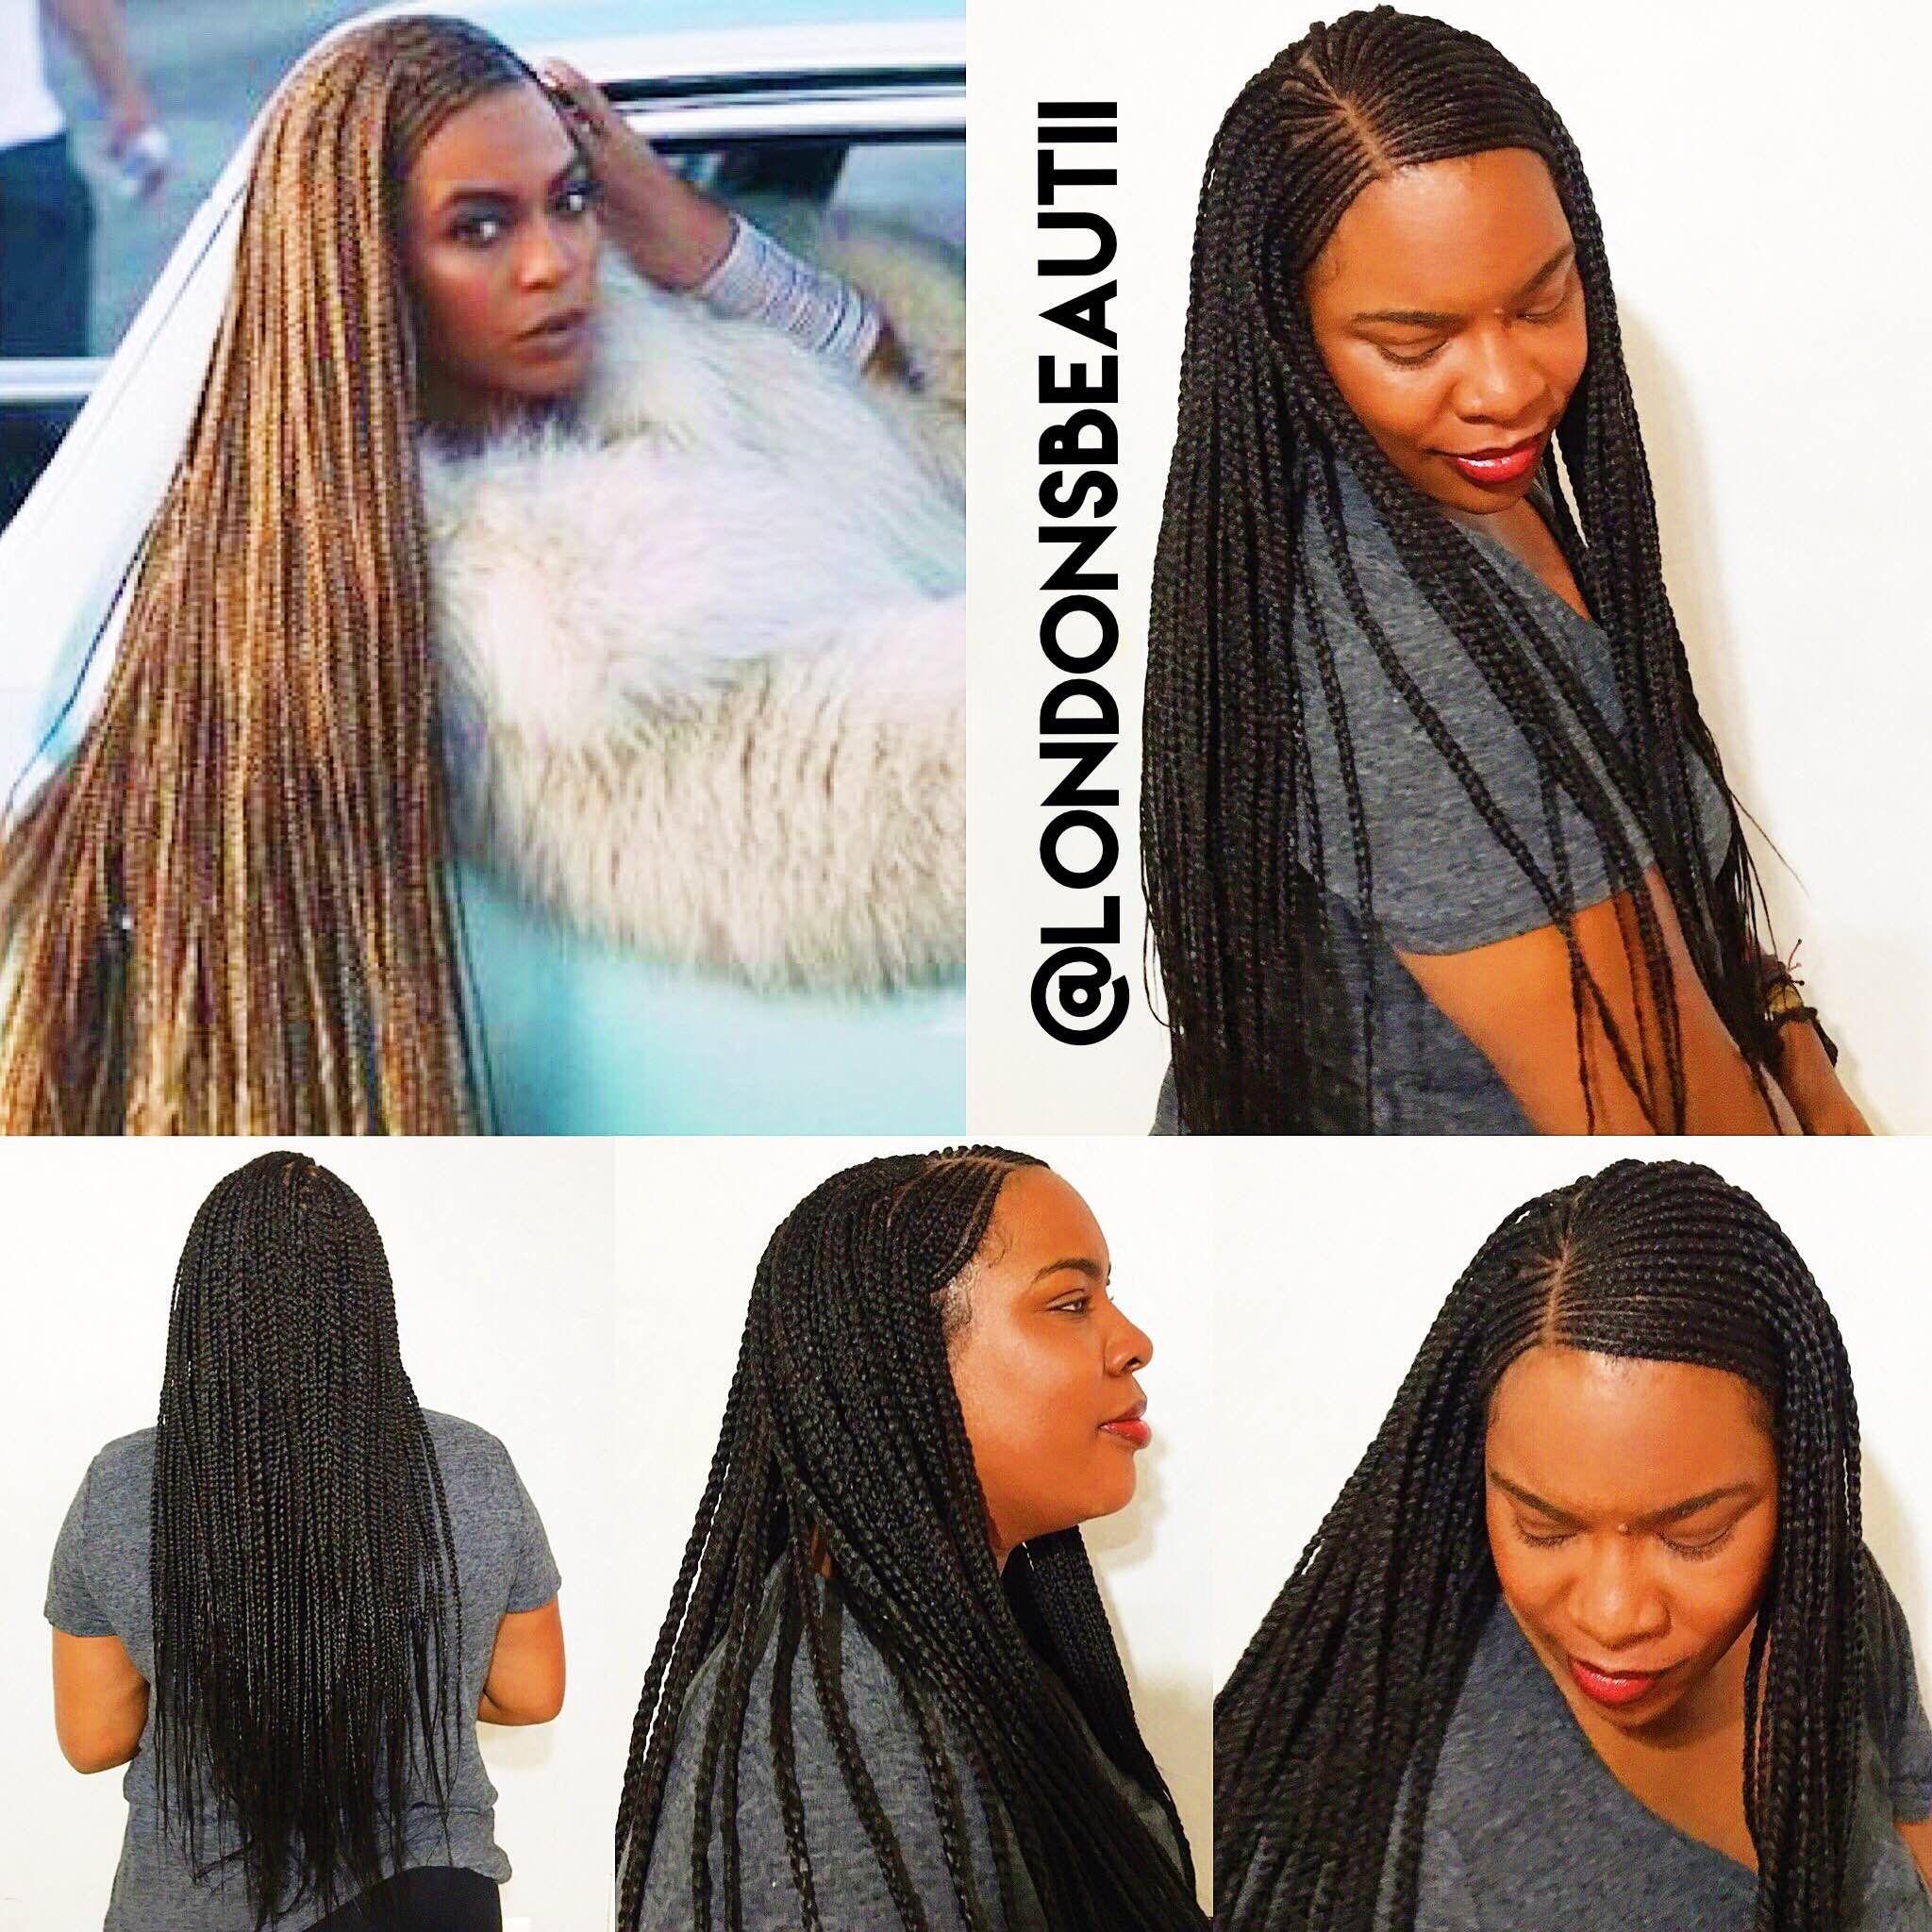 beyonce braided hairstyles fade haircut